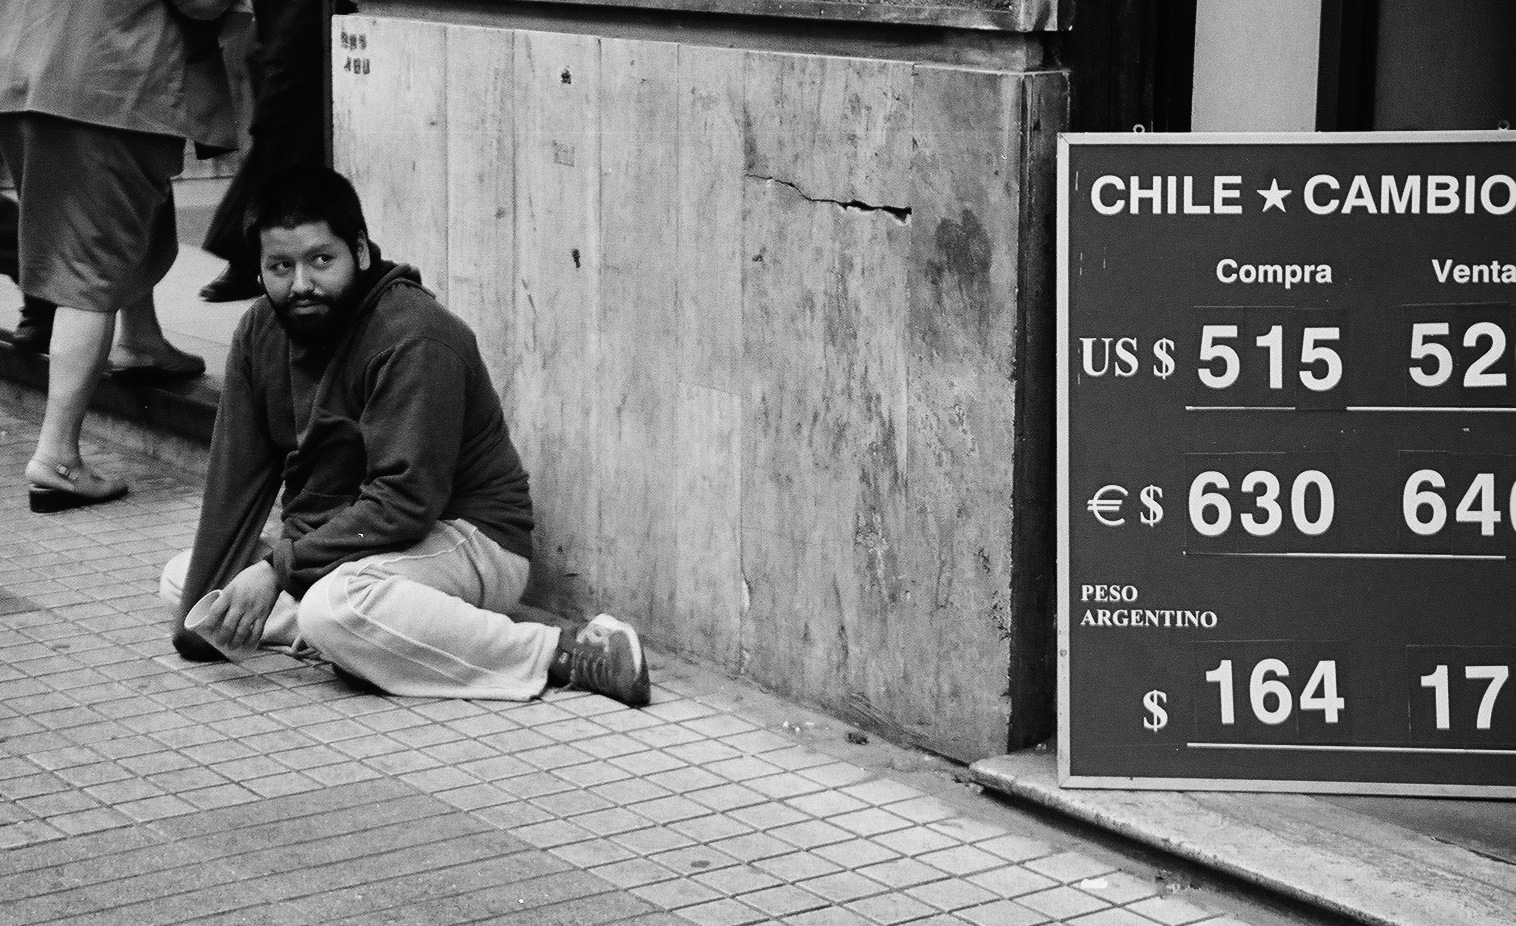 Chile *Cambio  by Colectivo Flashderelleno